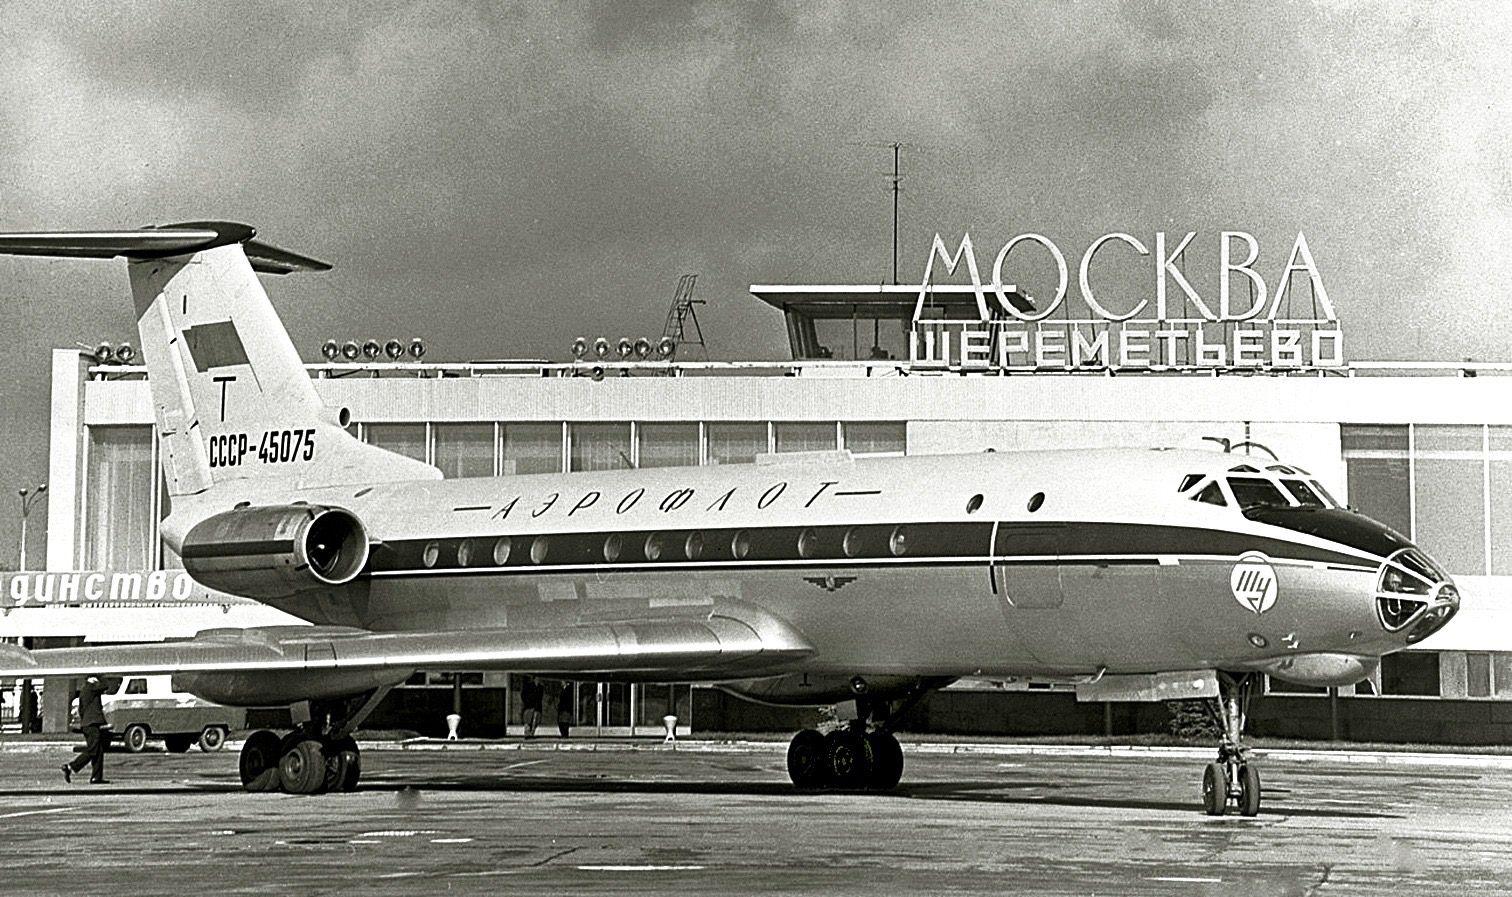 Aeroflot Tu134 СССР45075 Passenger, Aircraft